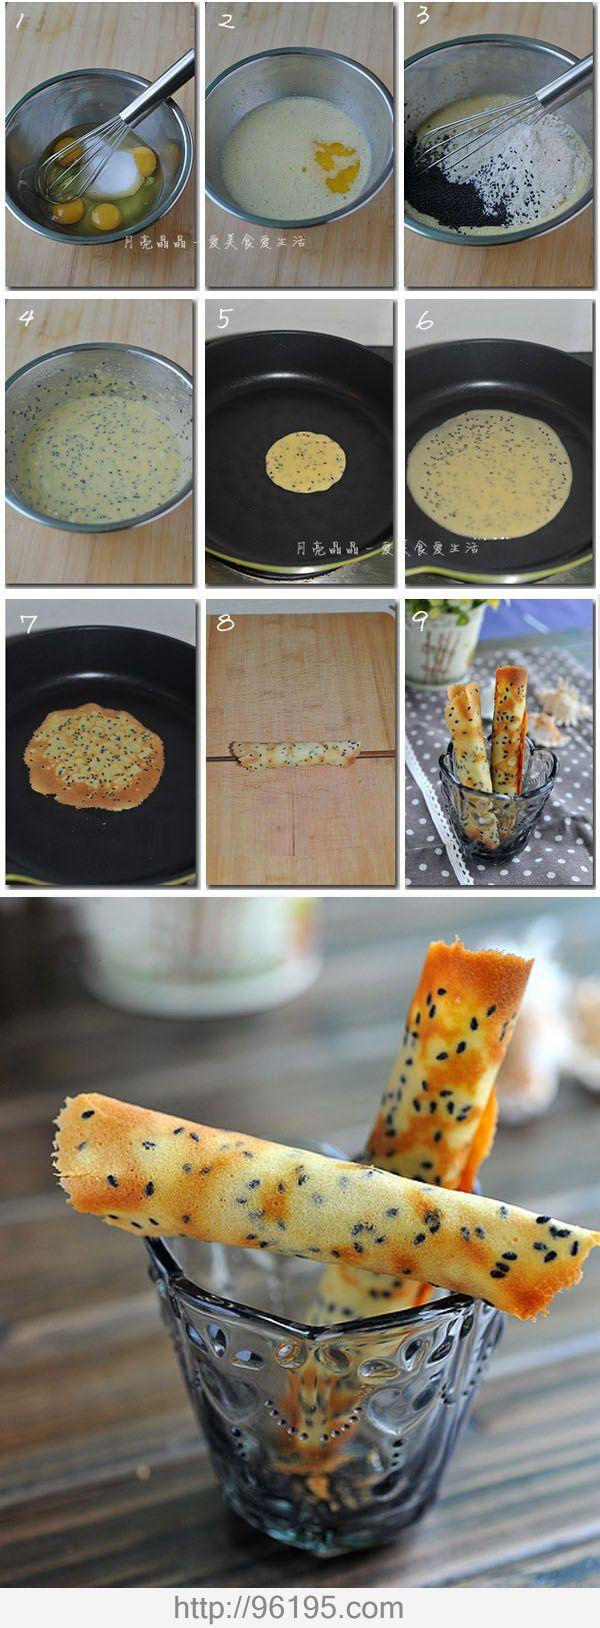 beautiful cookie rolls